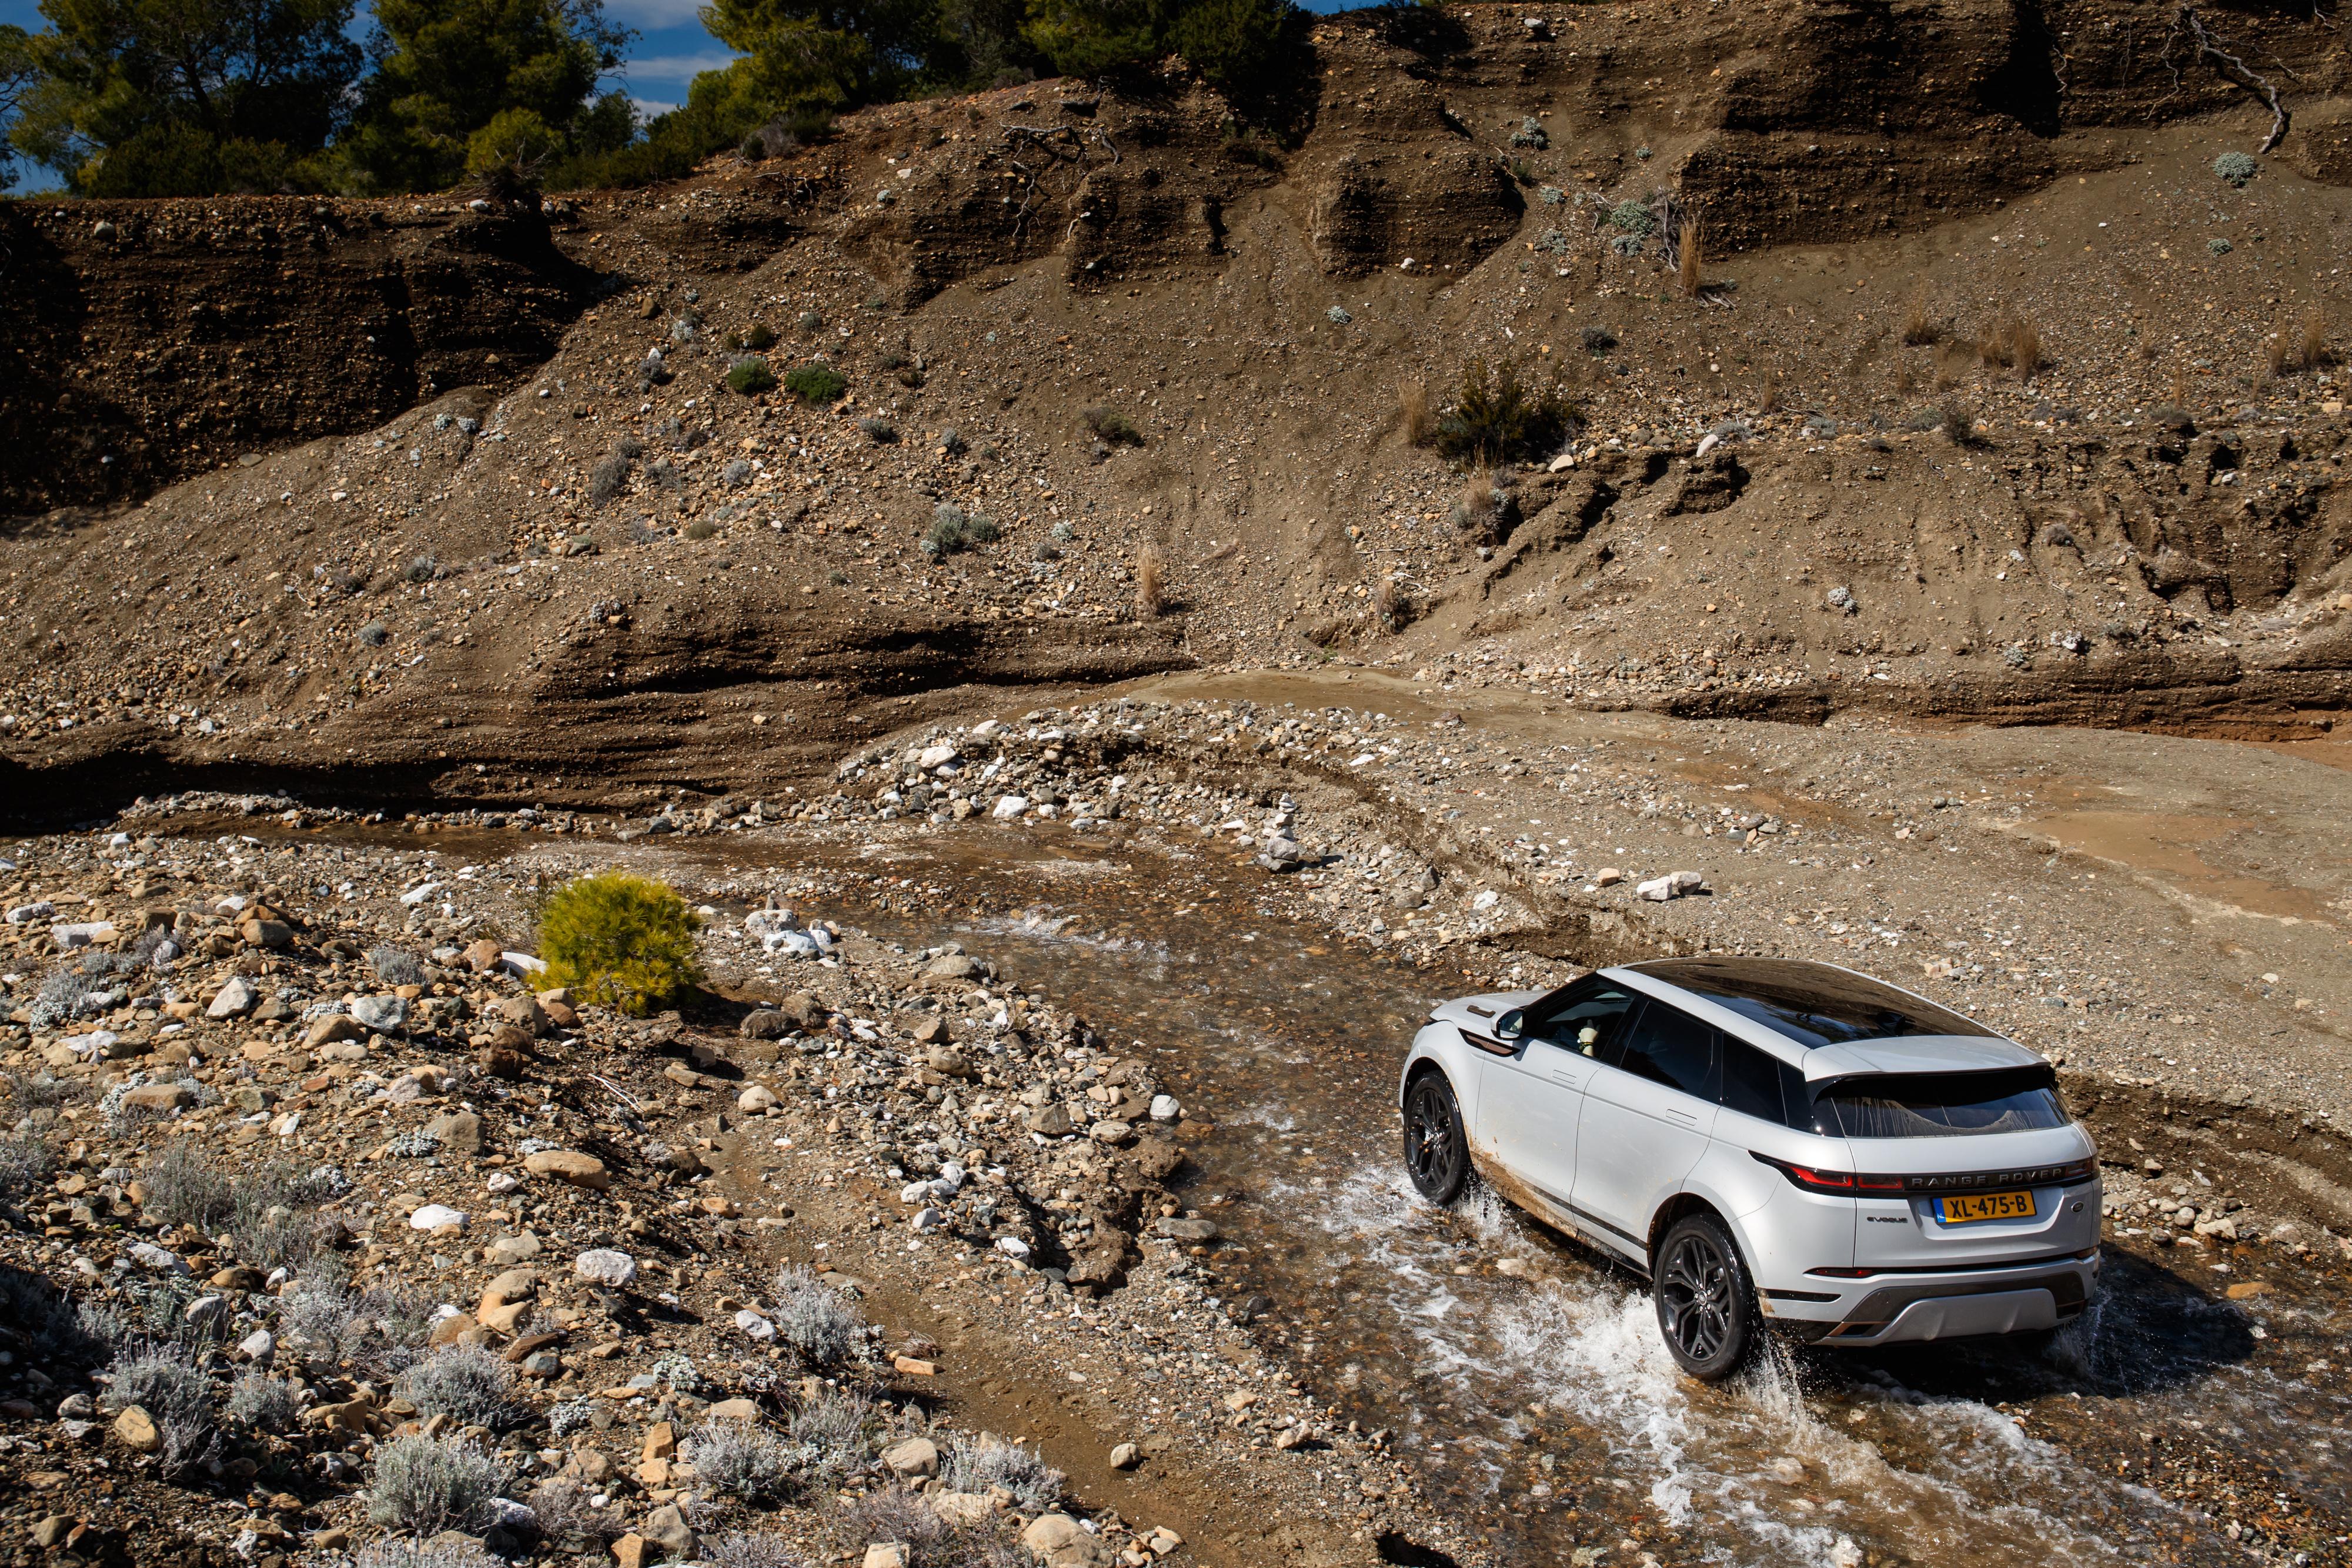 The 2019 Range Rover Evoque